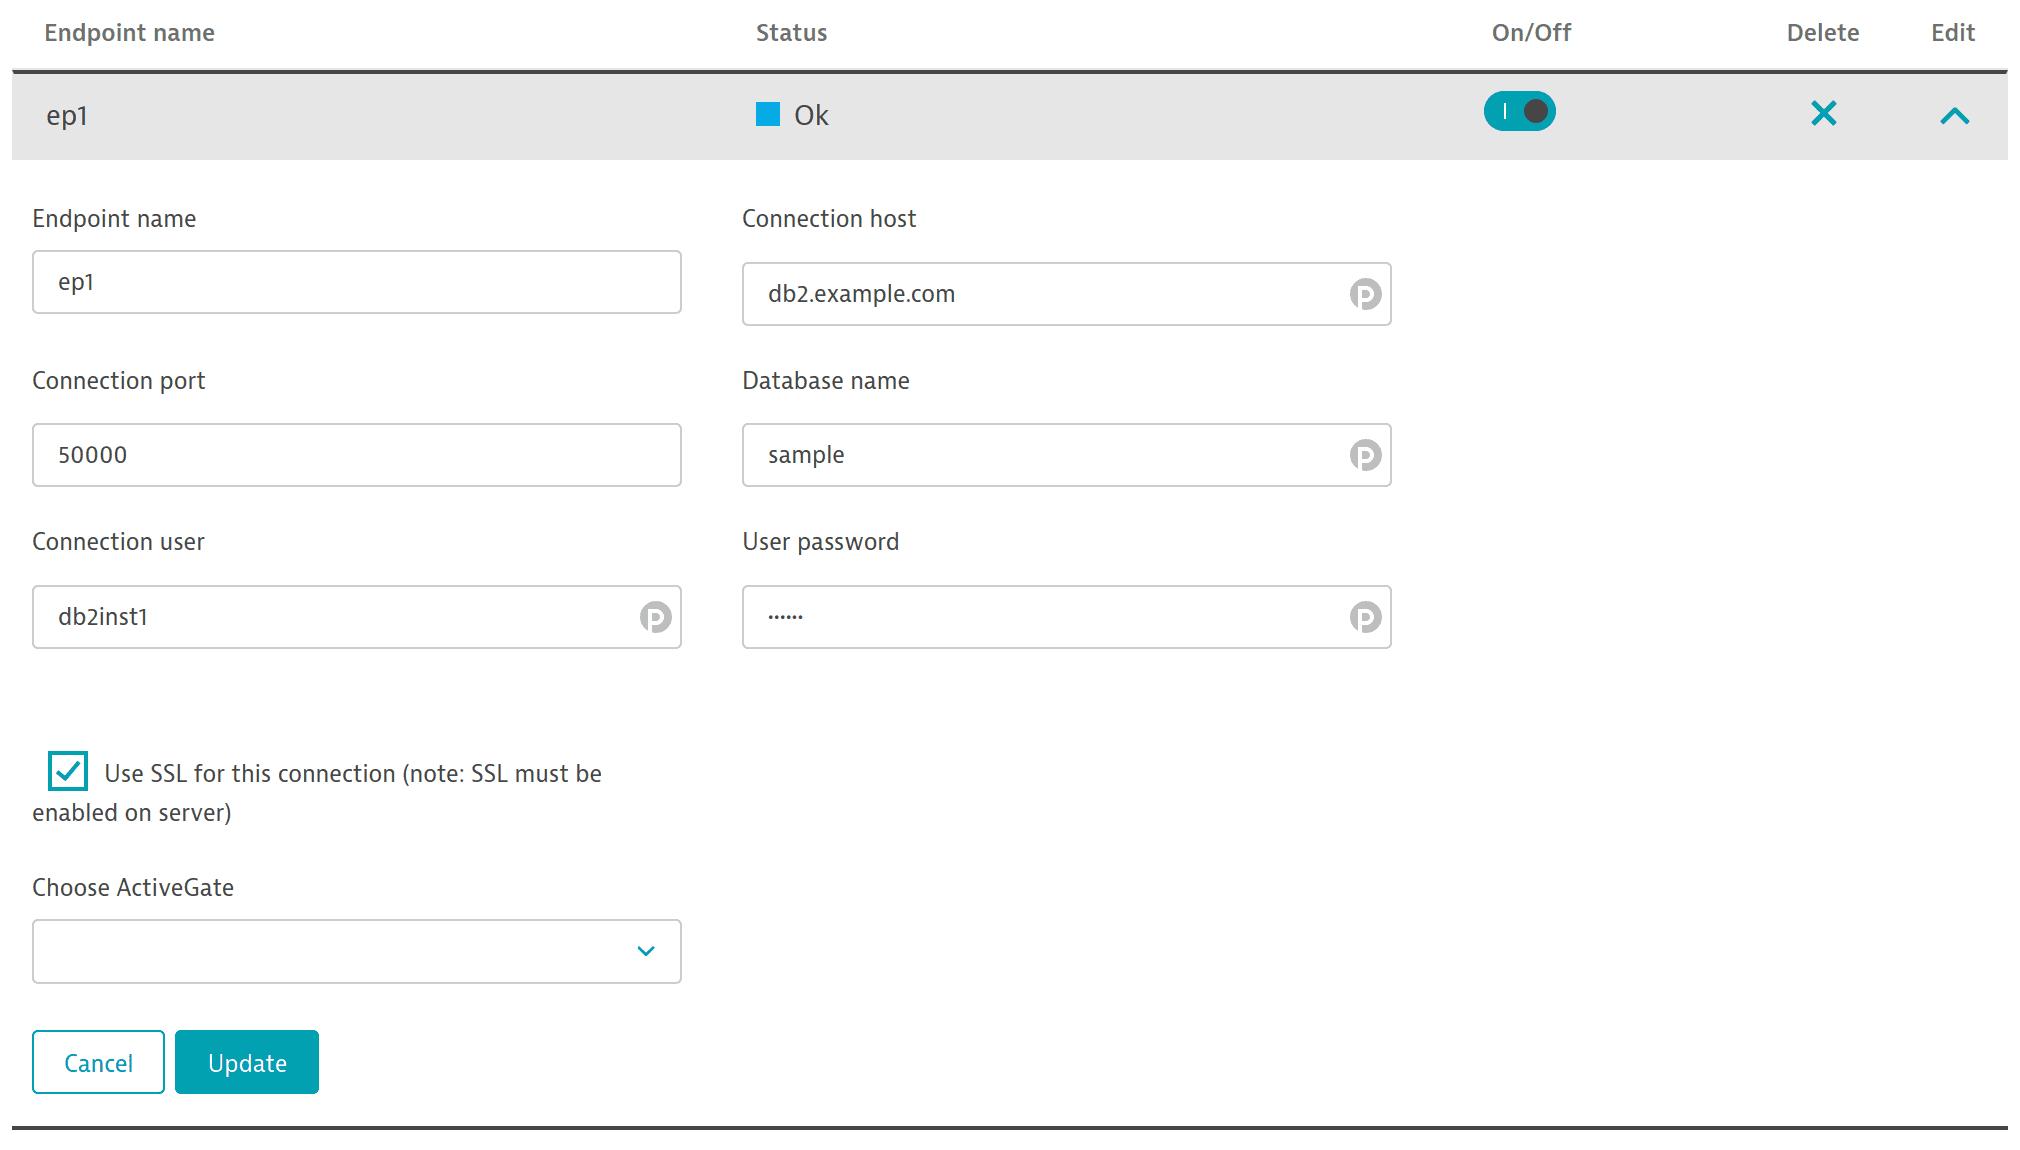 IBM DB2 ActiveGate extension endpoint configuration